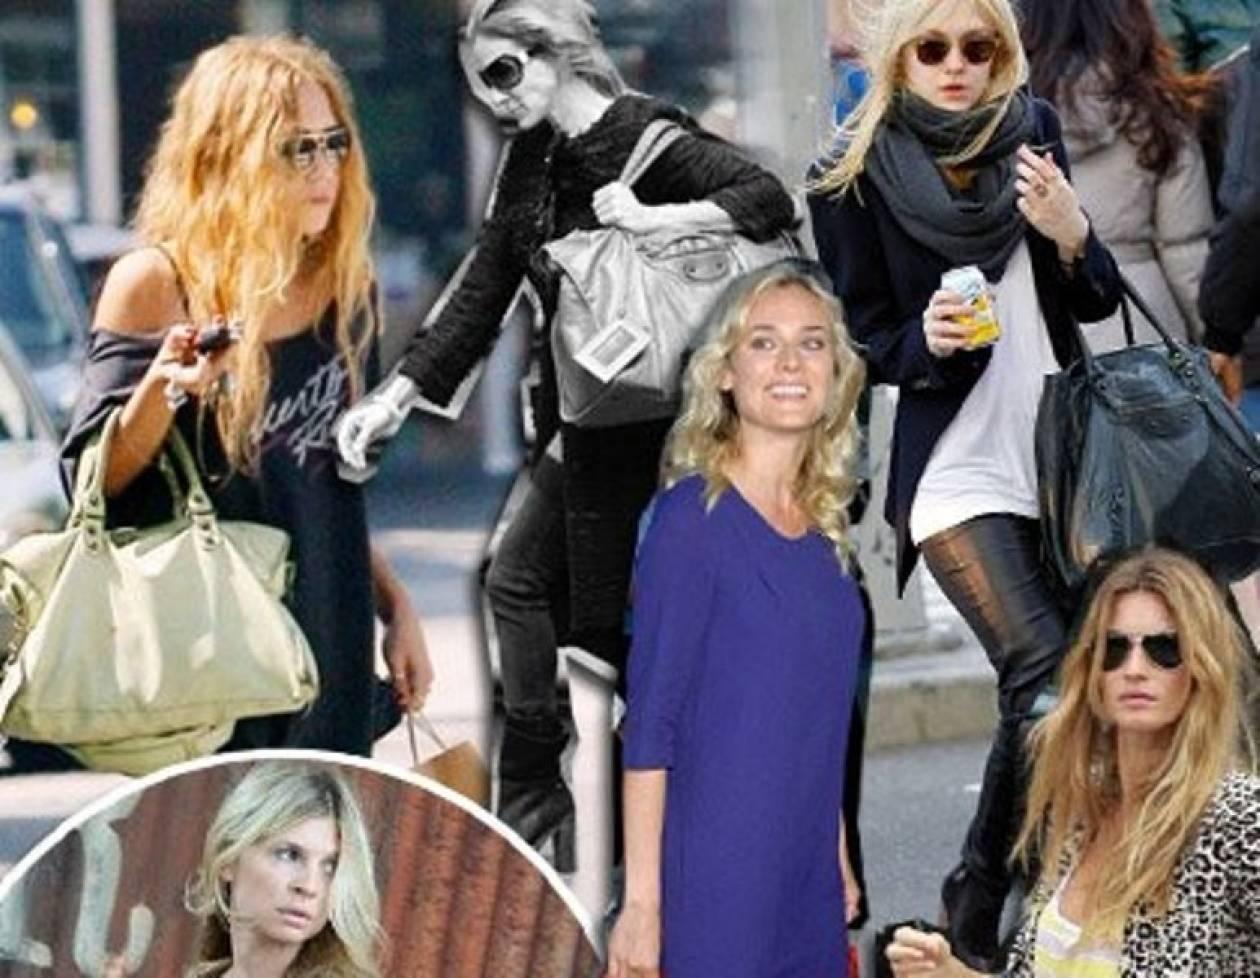 Balenciaga τσάντες & celebrities: Σχέση που μετρά μια 10ετία